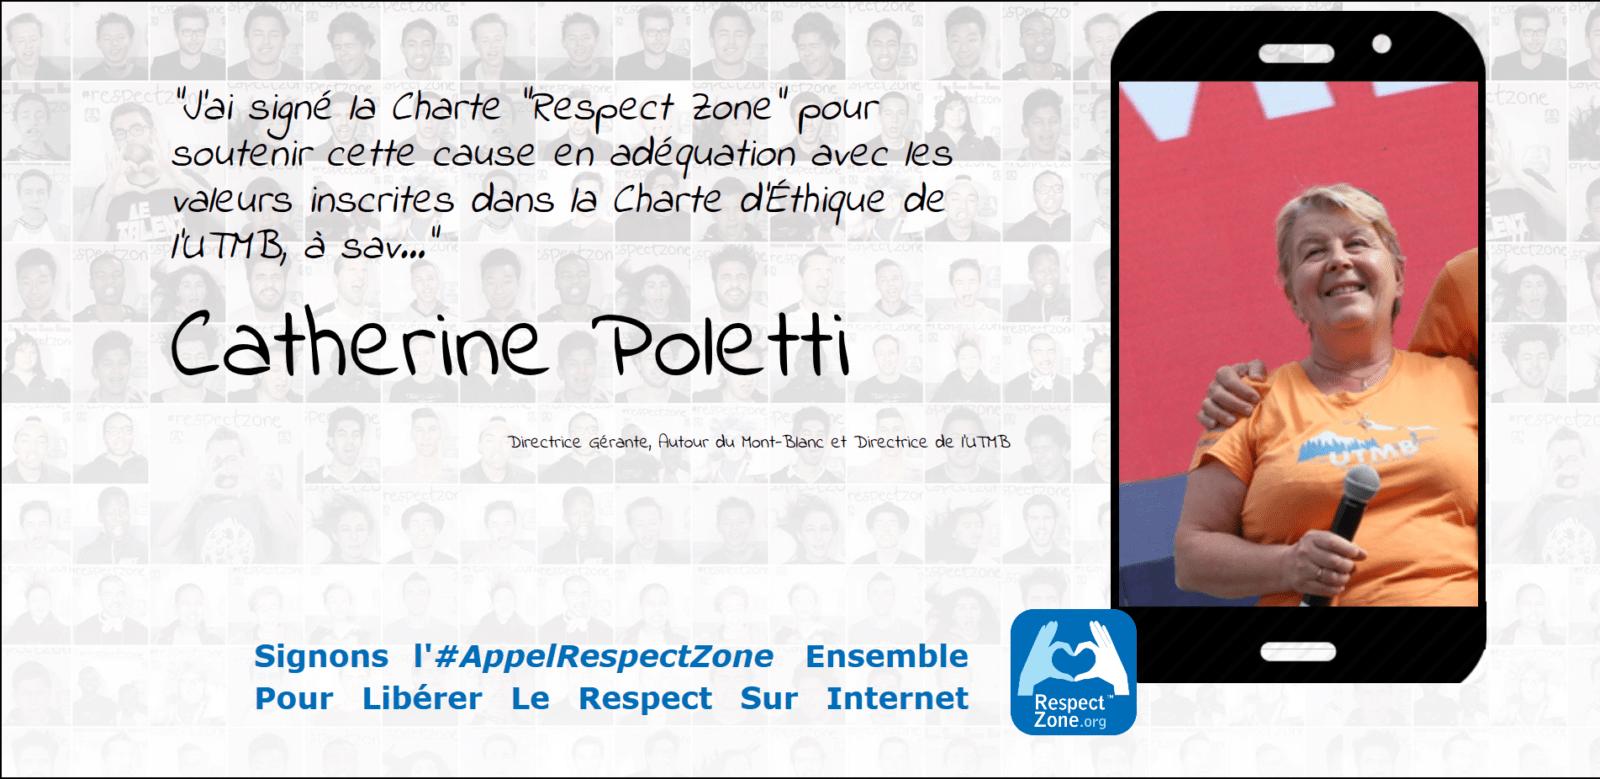 Catherine Poletti